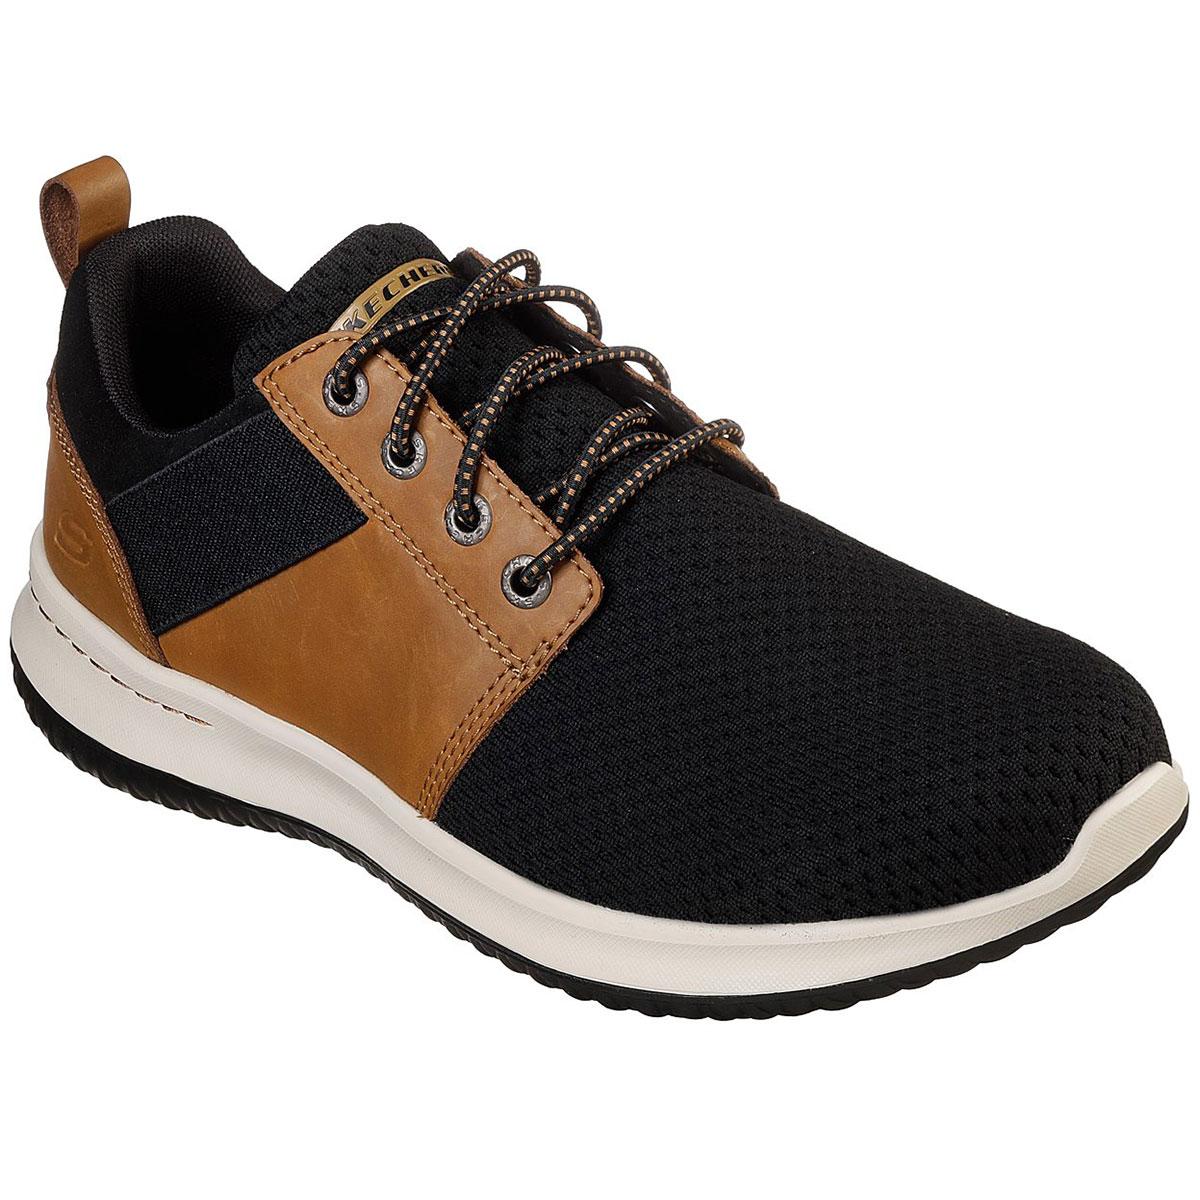 "Skechers Men's Delson A "" Brant Sneakers - Black, 10"